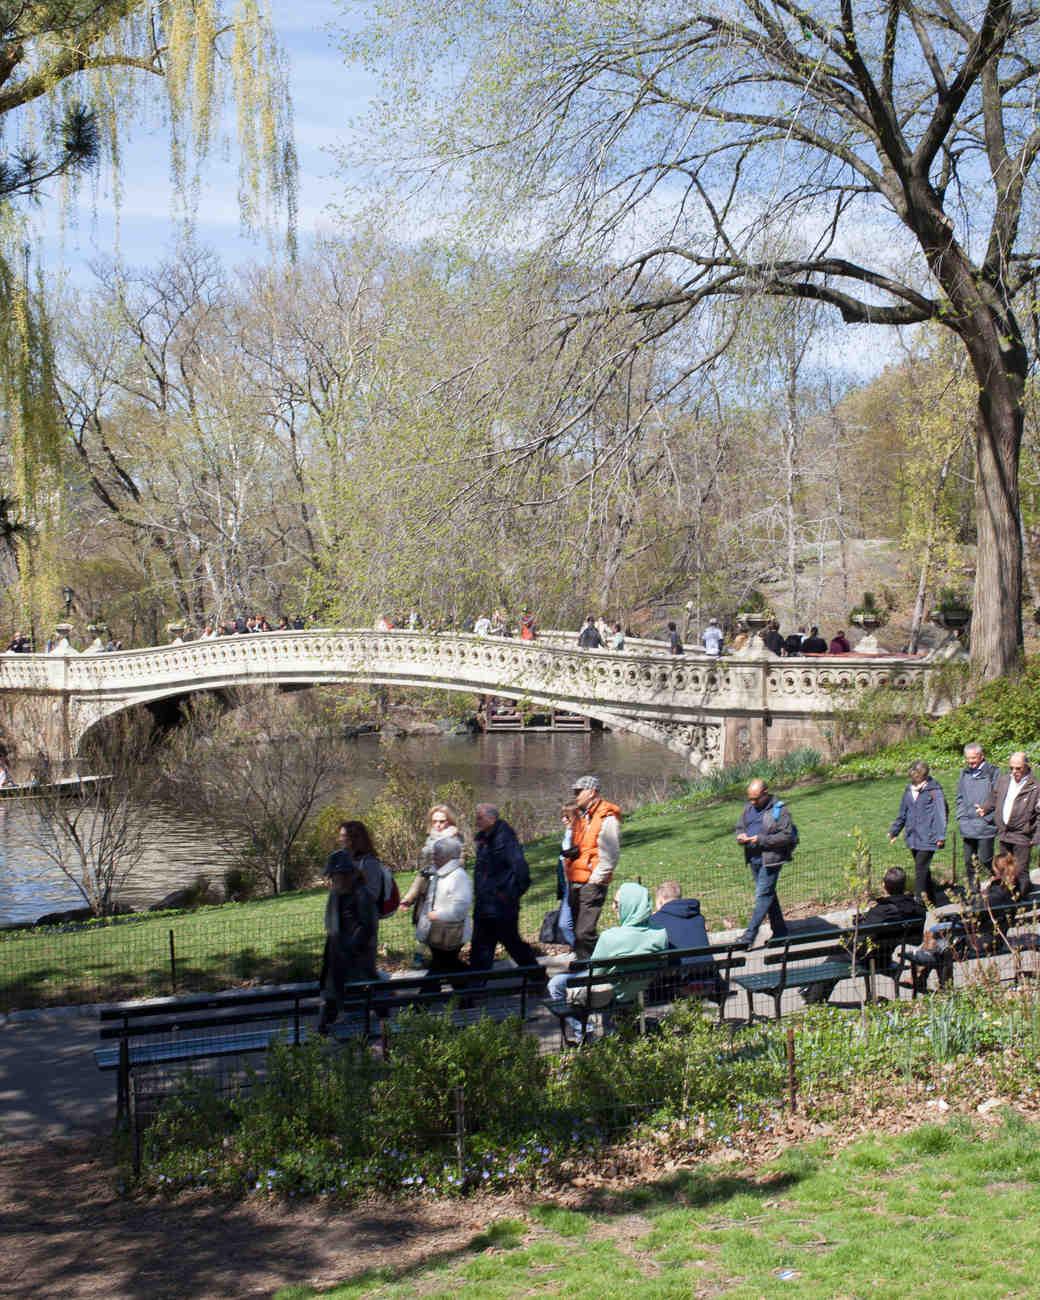 nyc-proposal-spot-central-park-bow-bridge-1114.jpg